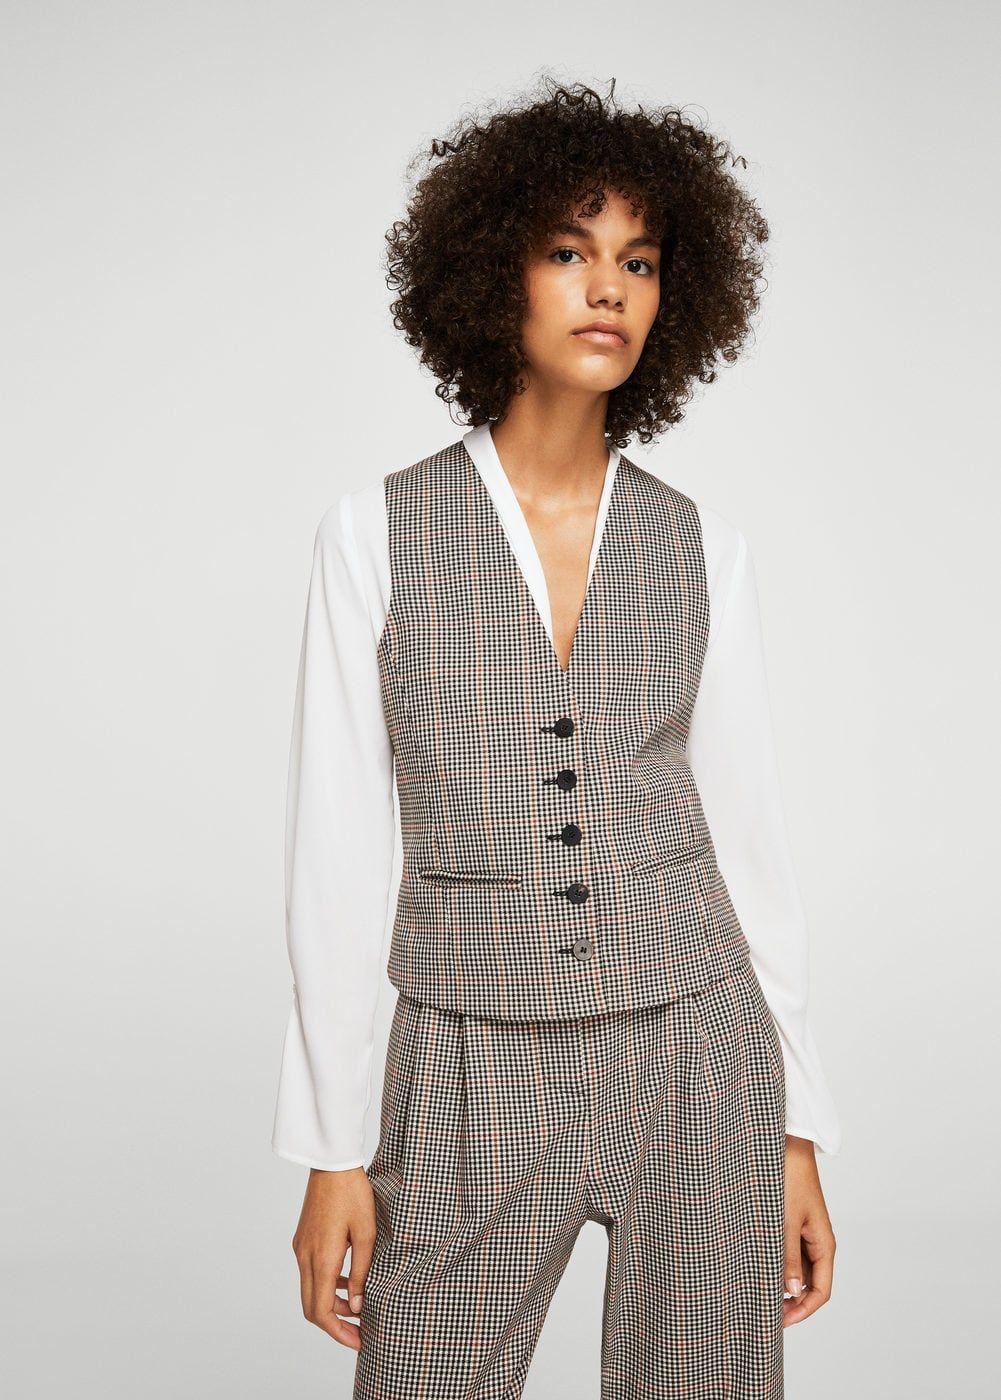 Chaleco traje cuadros - Chaquetas de Mujer  2714b4cb1ffd